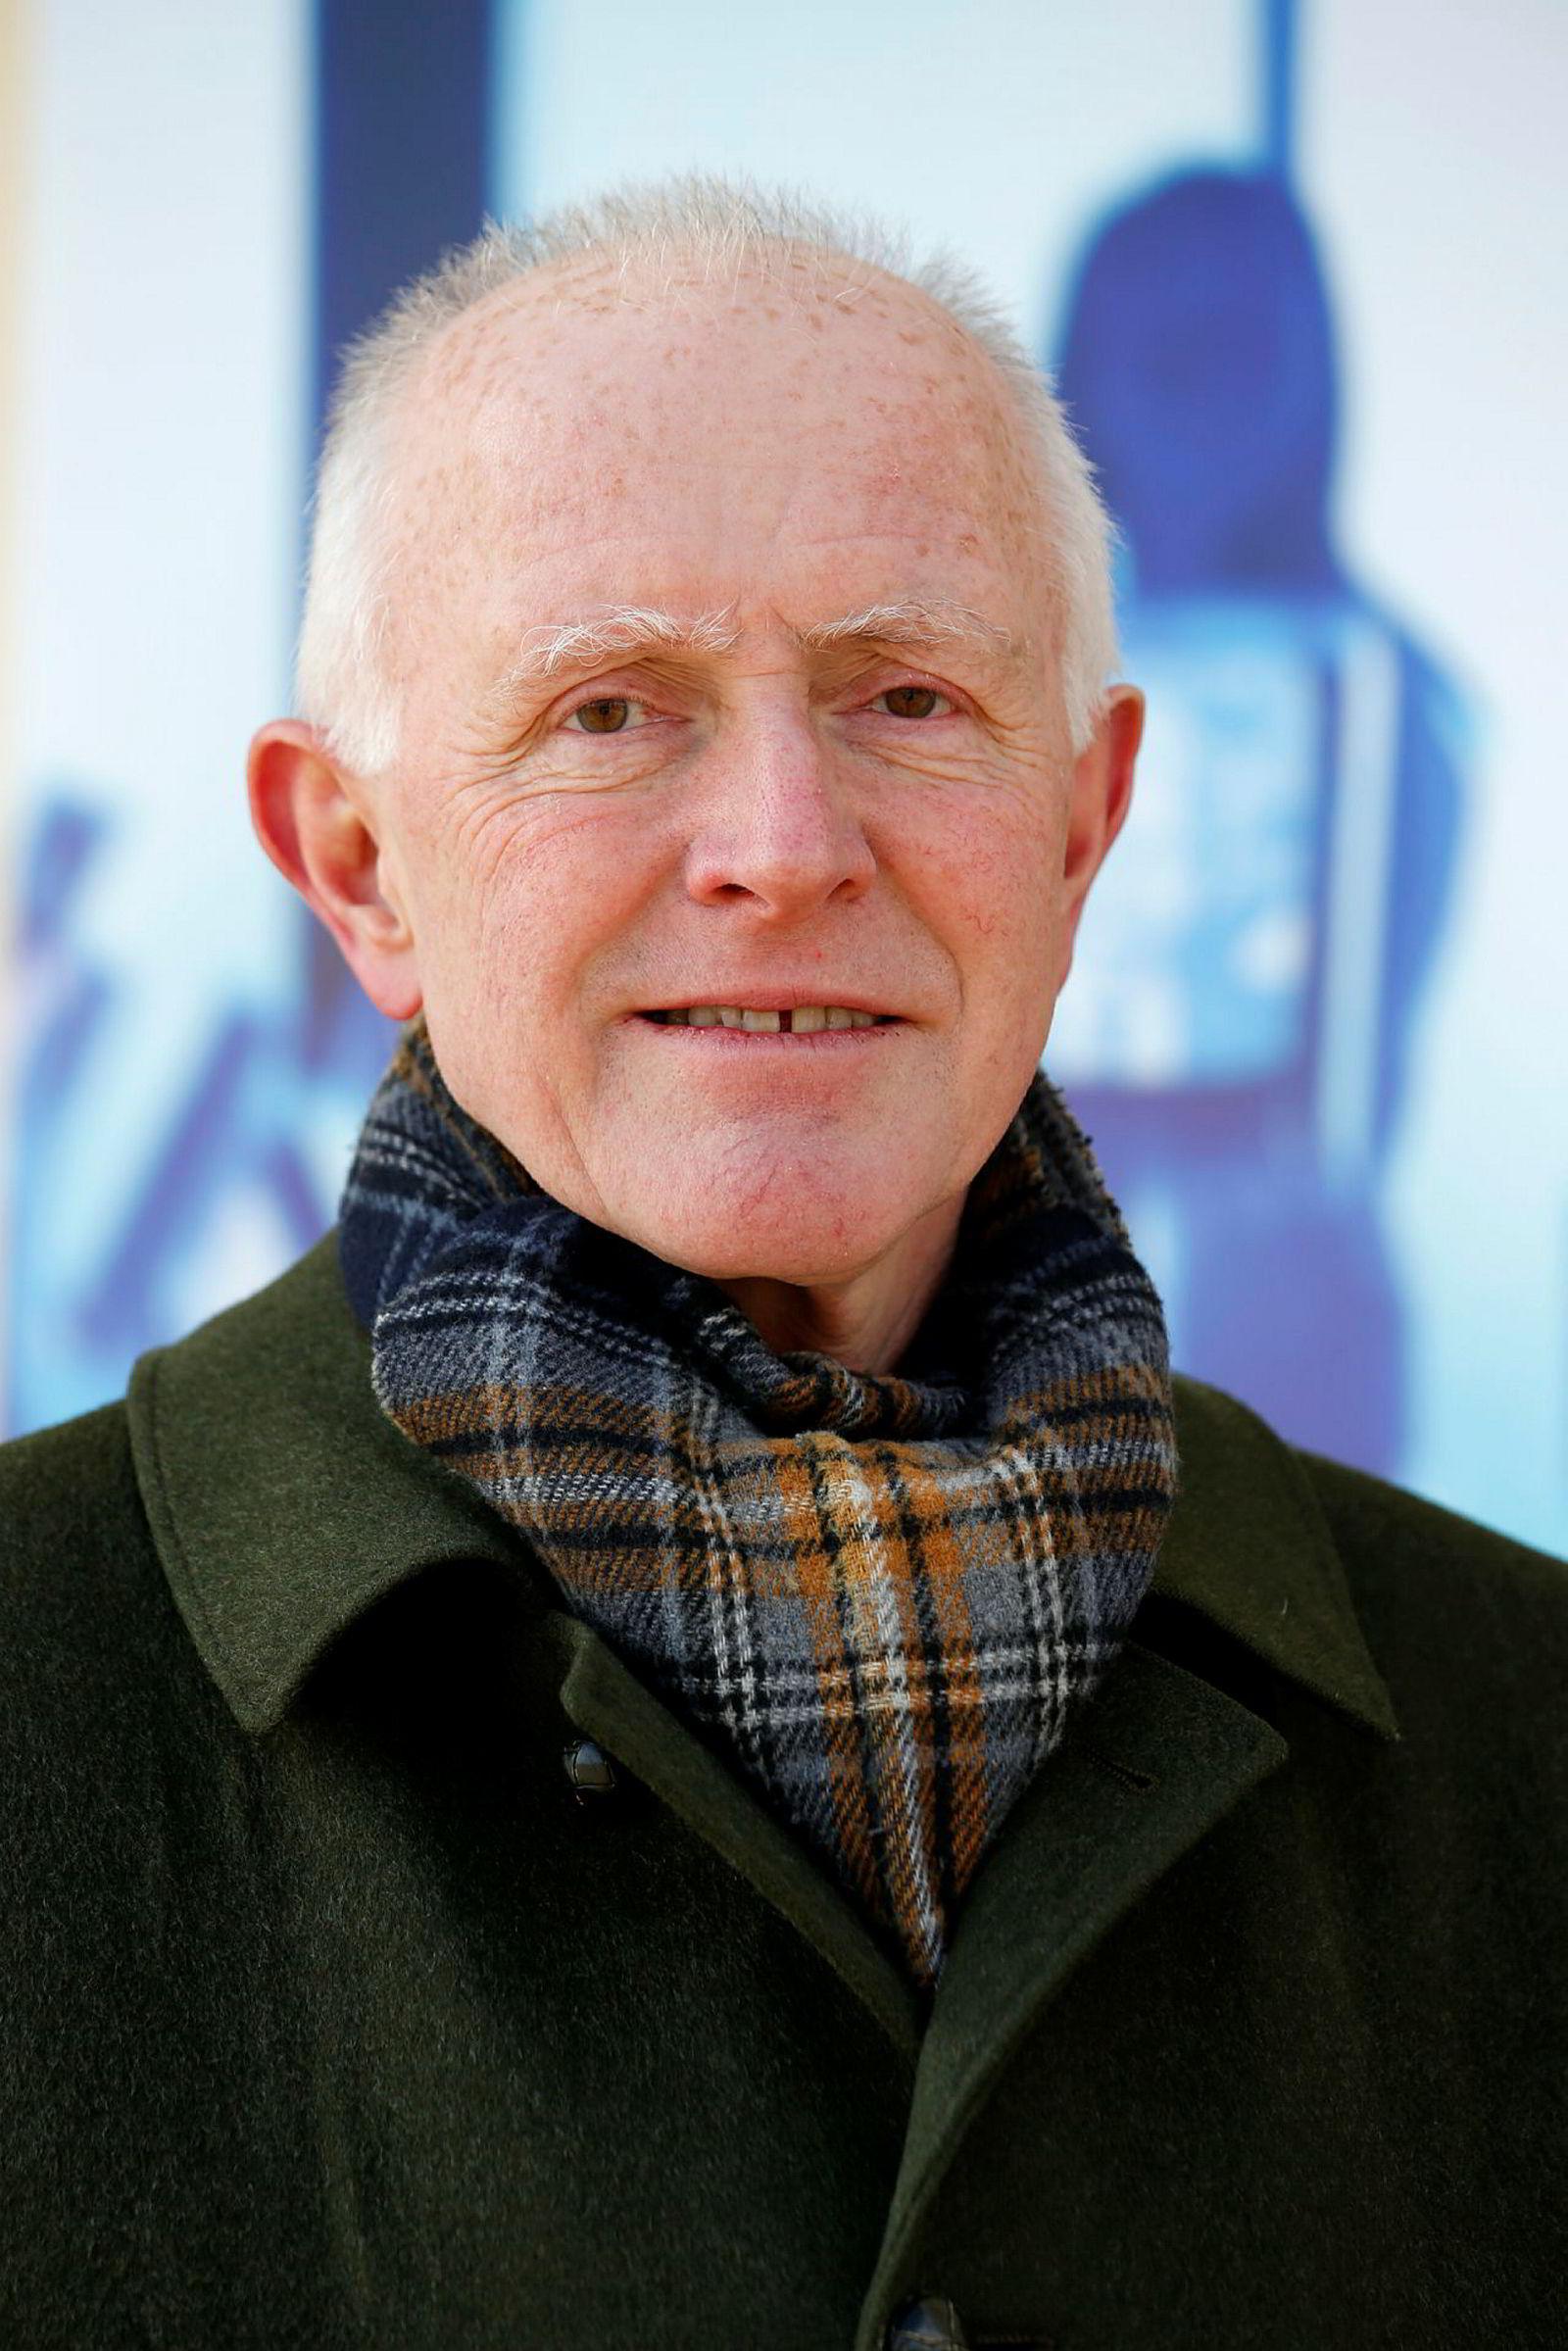 Øivind Christoffersen overtar som toppsjef i Boligbygg på midlertidig basis.